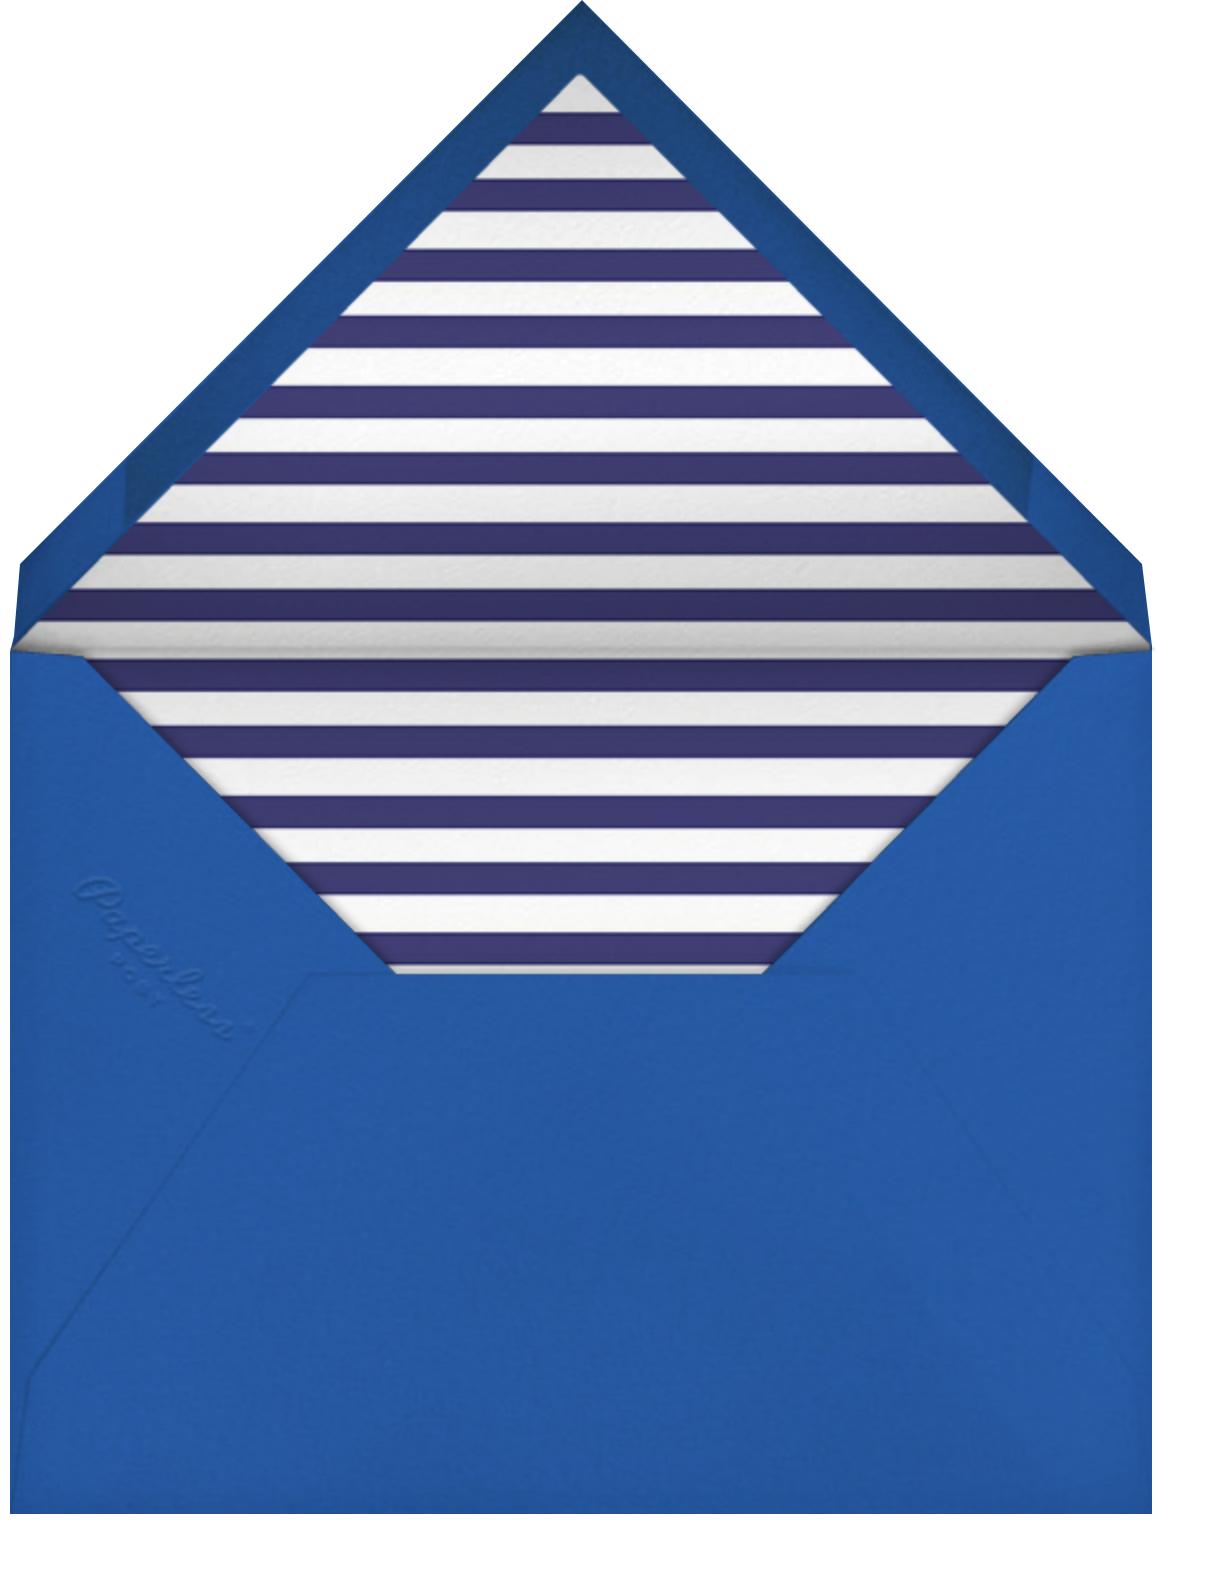 French Mommy - Light - Mr. Boddington's Studio - Mother's Day - envelope back